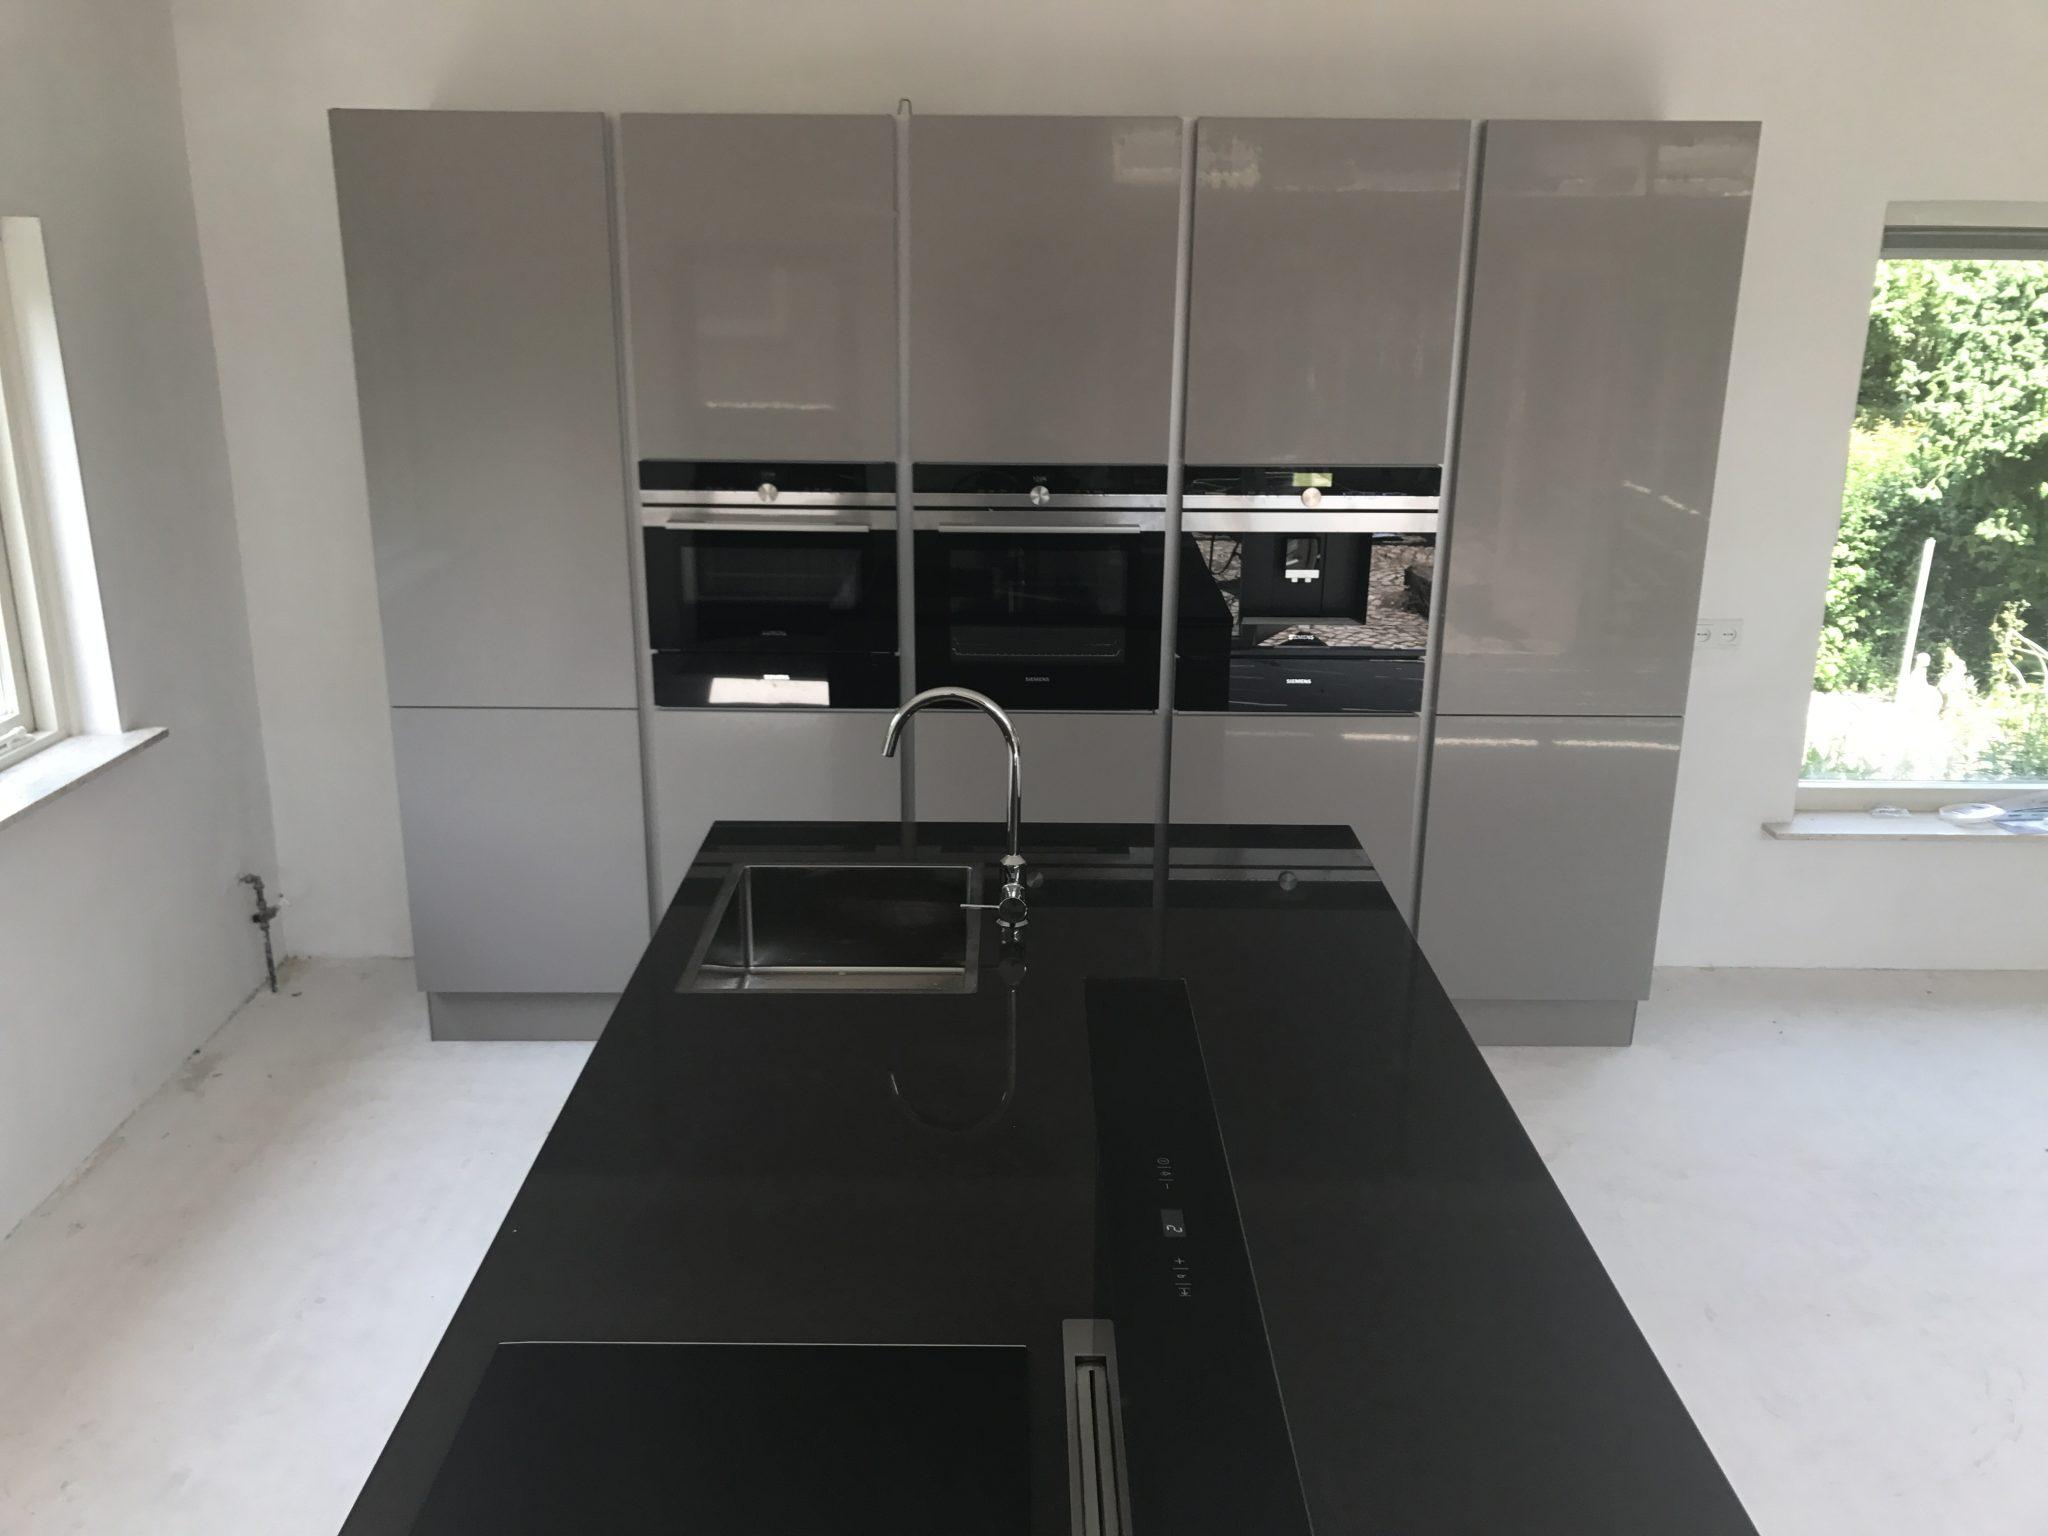 Nolte Keukens Rotterdam : Nolte keuken marco rietdijk keukenmontage